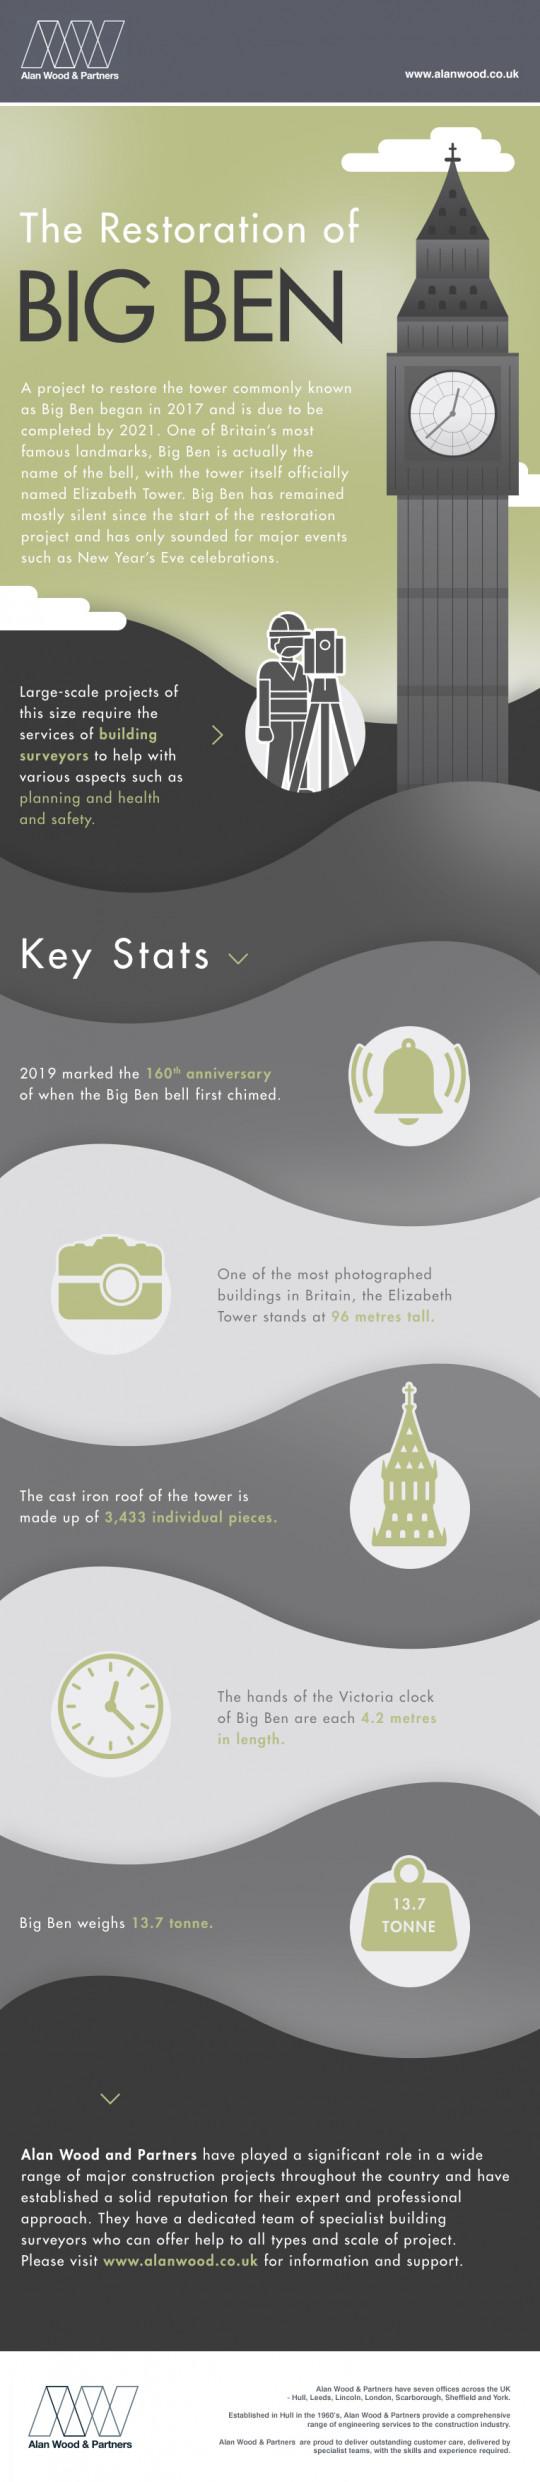 The Restoration of Big Ben